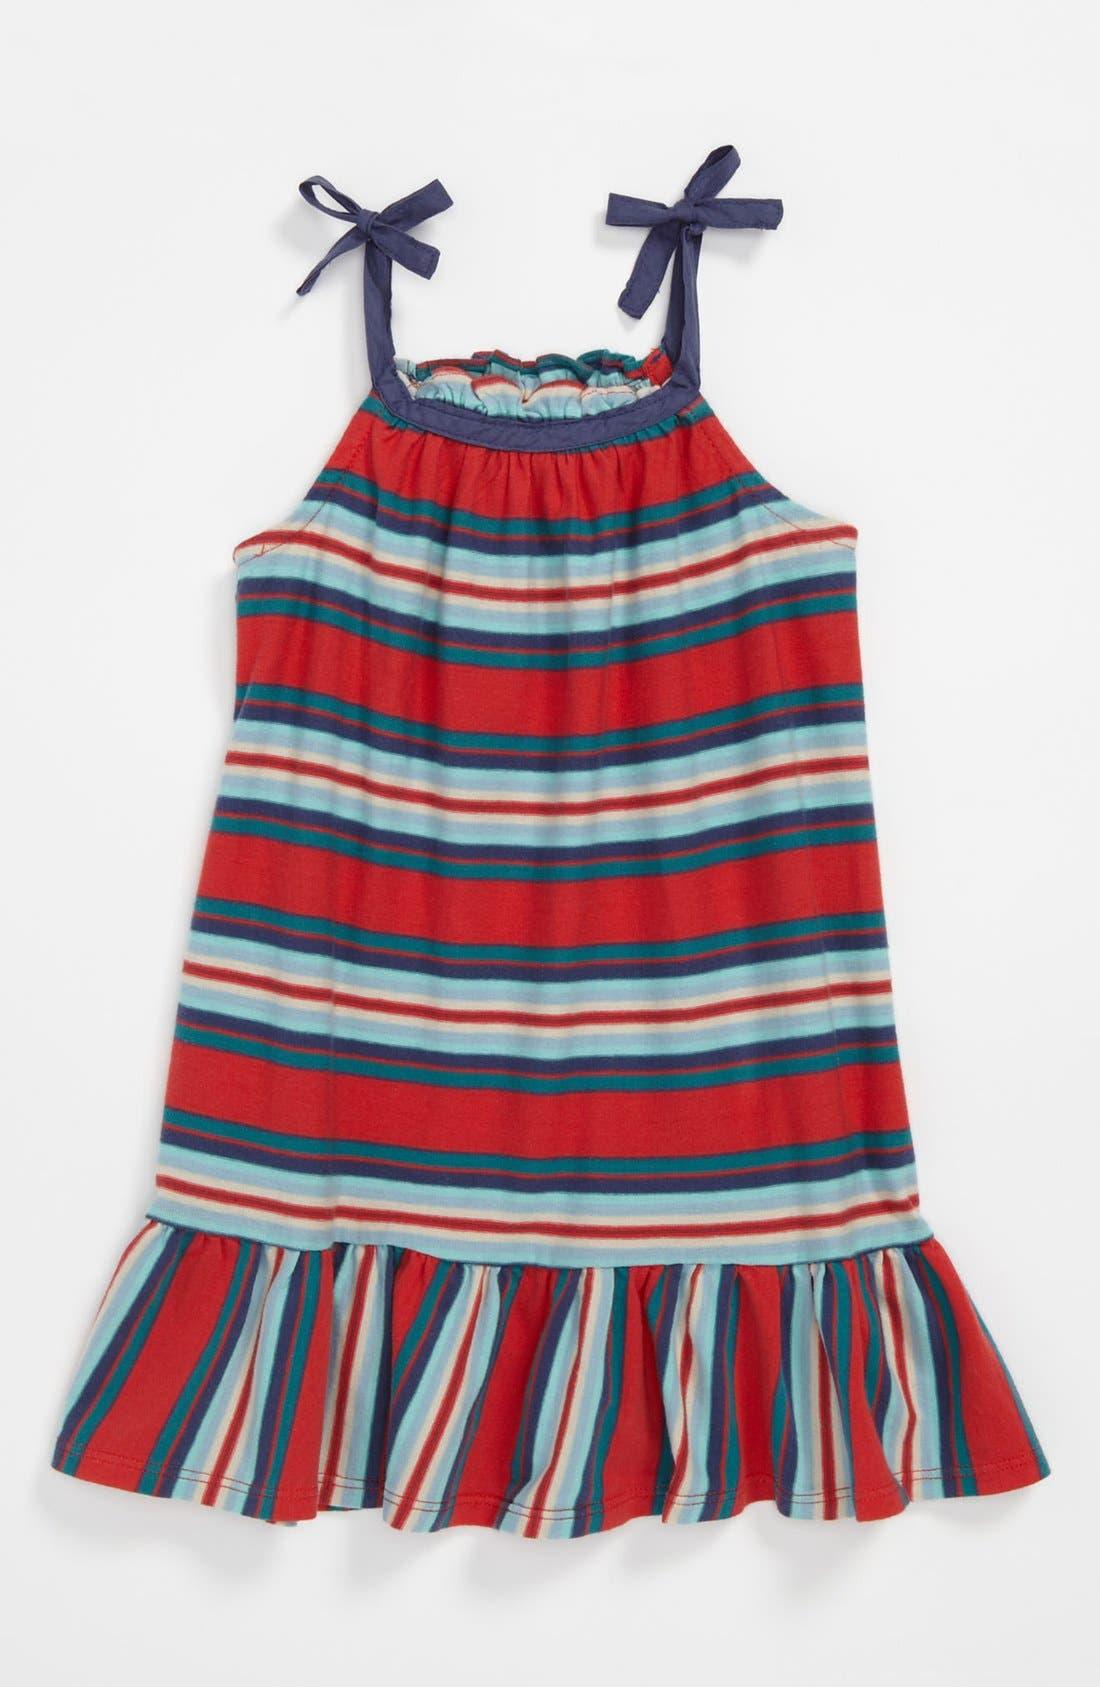 Alternate Image 1 Selected - Tea Collection 'Venda' Trapeze Dress (Baby)